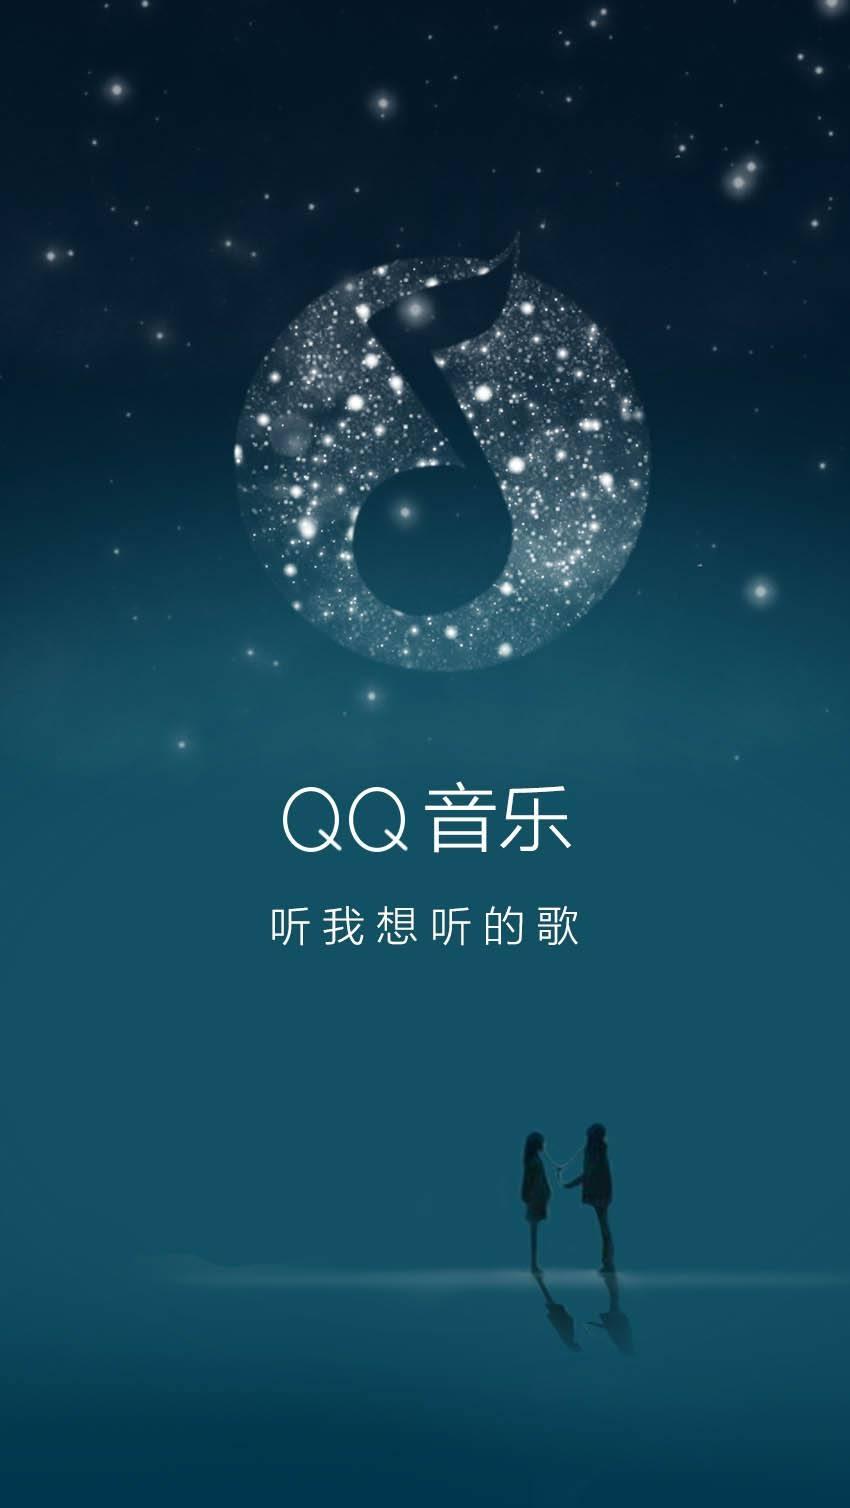 QQ音乐去广告版1.jpg